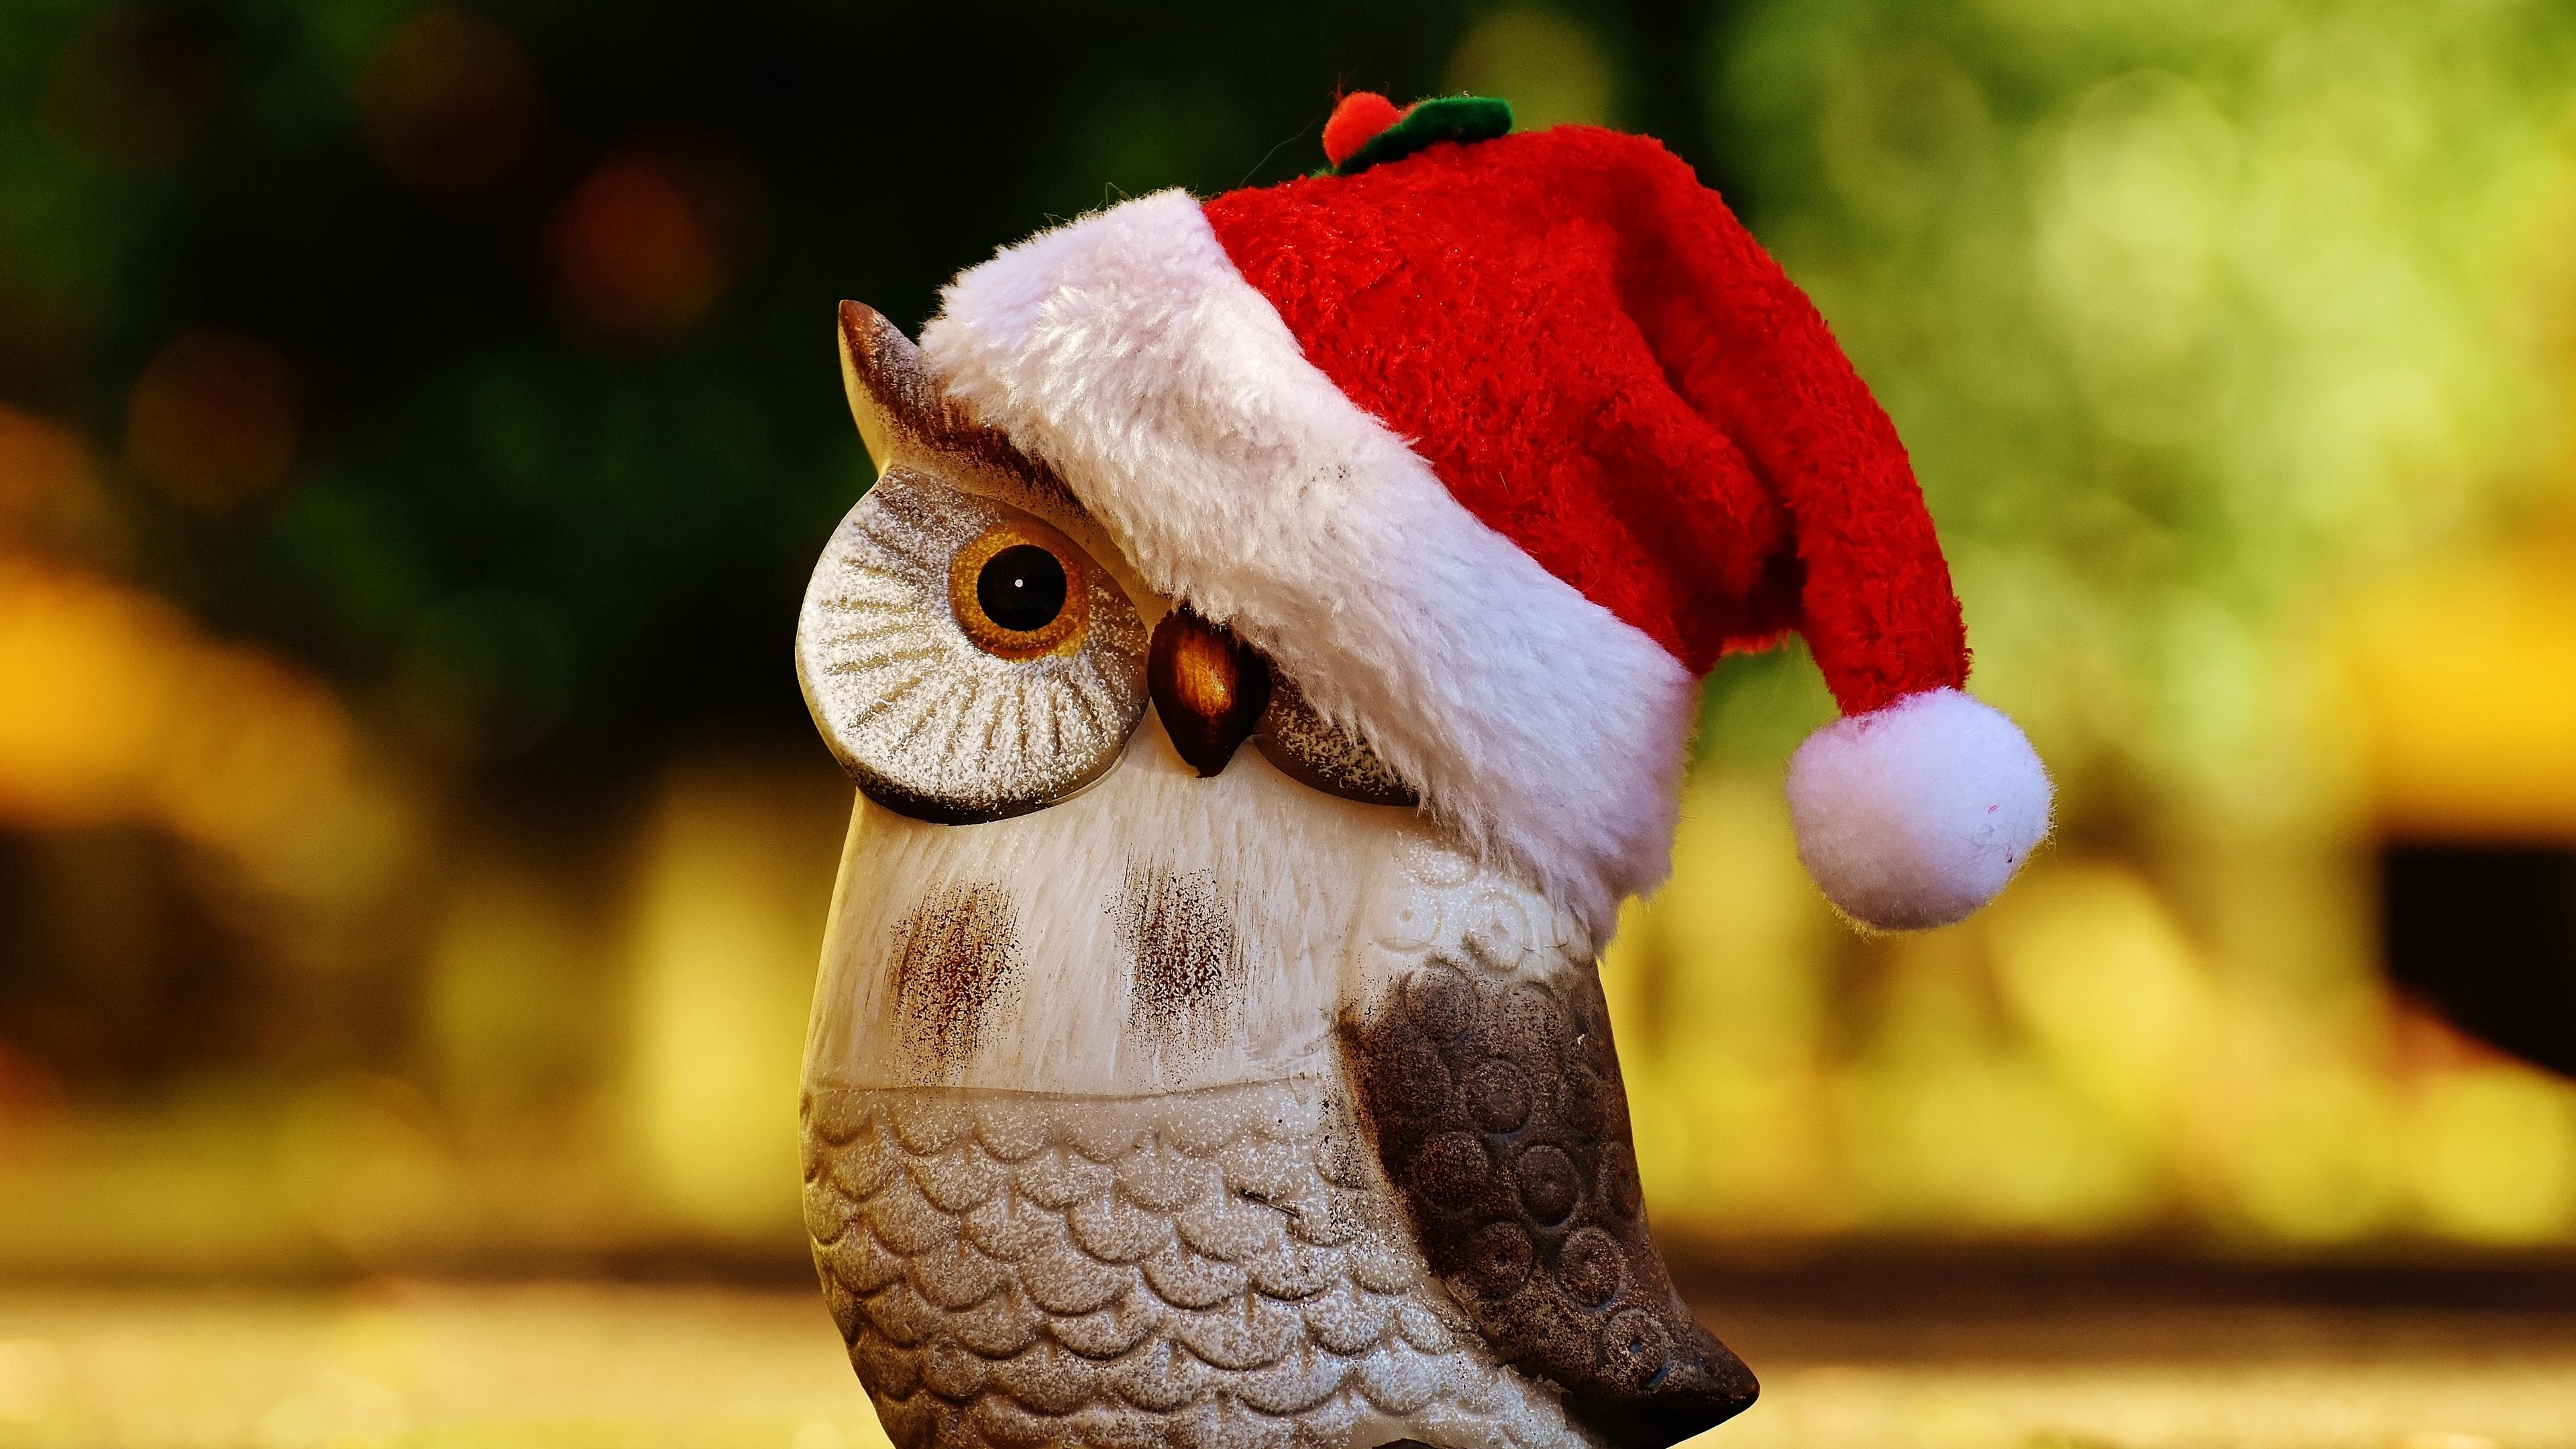 owl hat santa claus figurine 4k 1538344576 - owl, hat, santa claus, figurine 4k - santa claus, Owl, hat